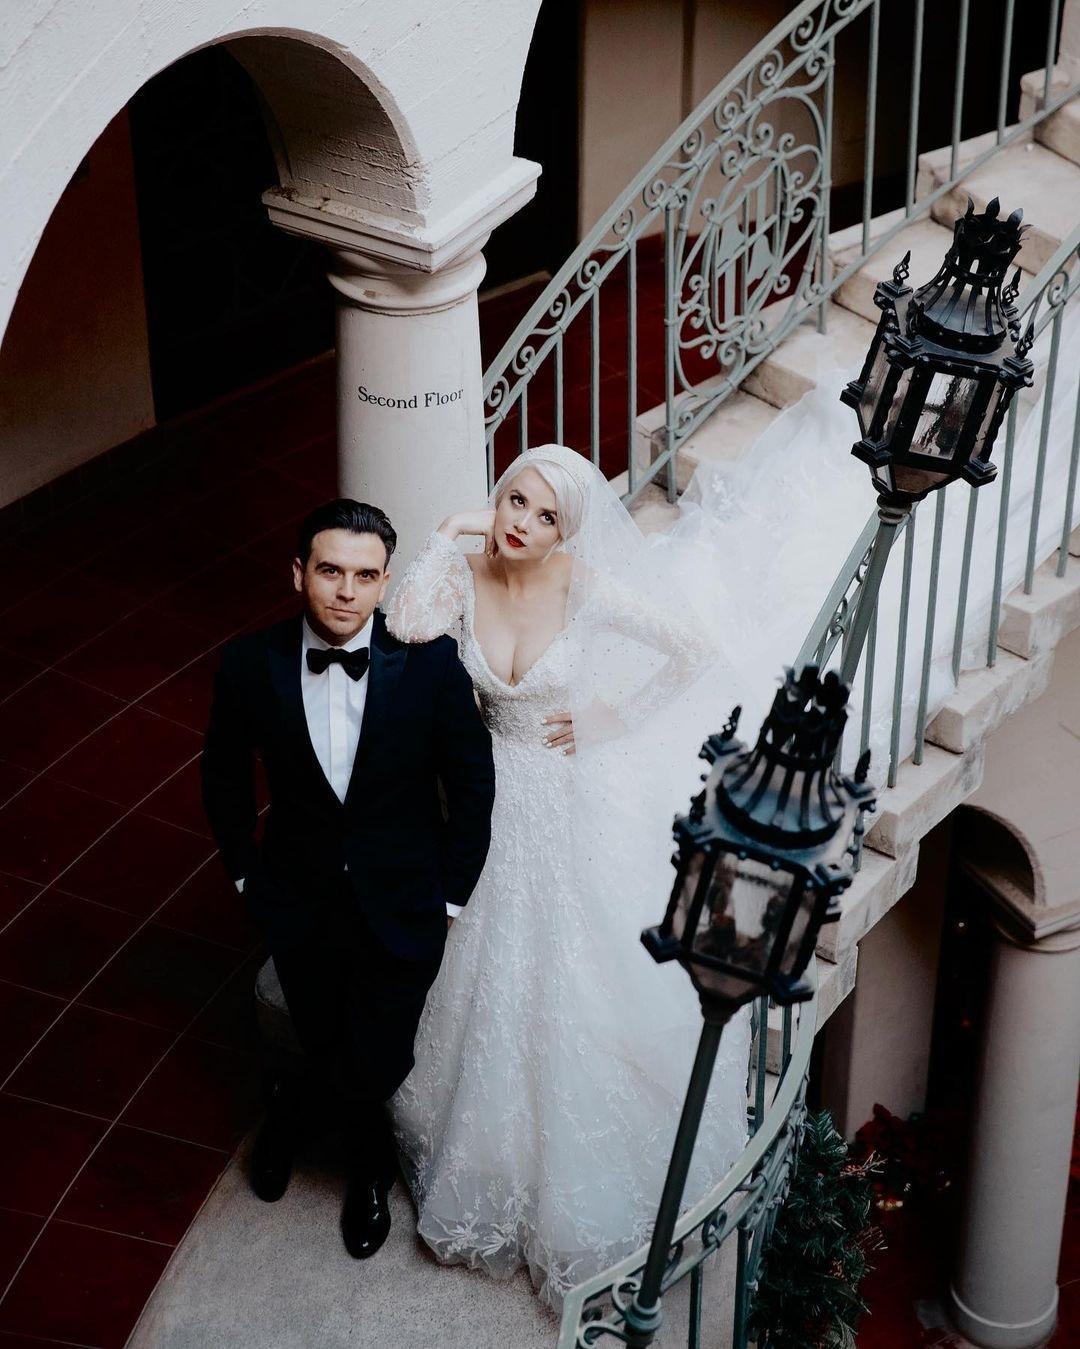 мика ньютон муж свадьба отношения